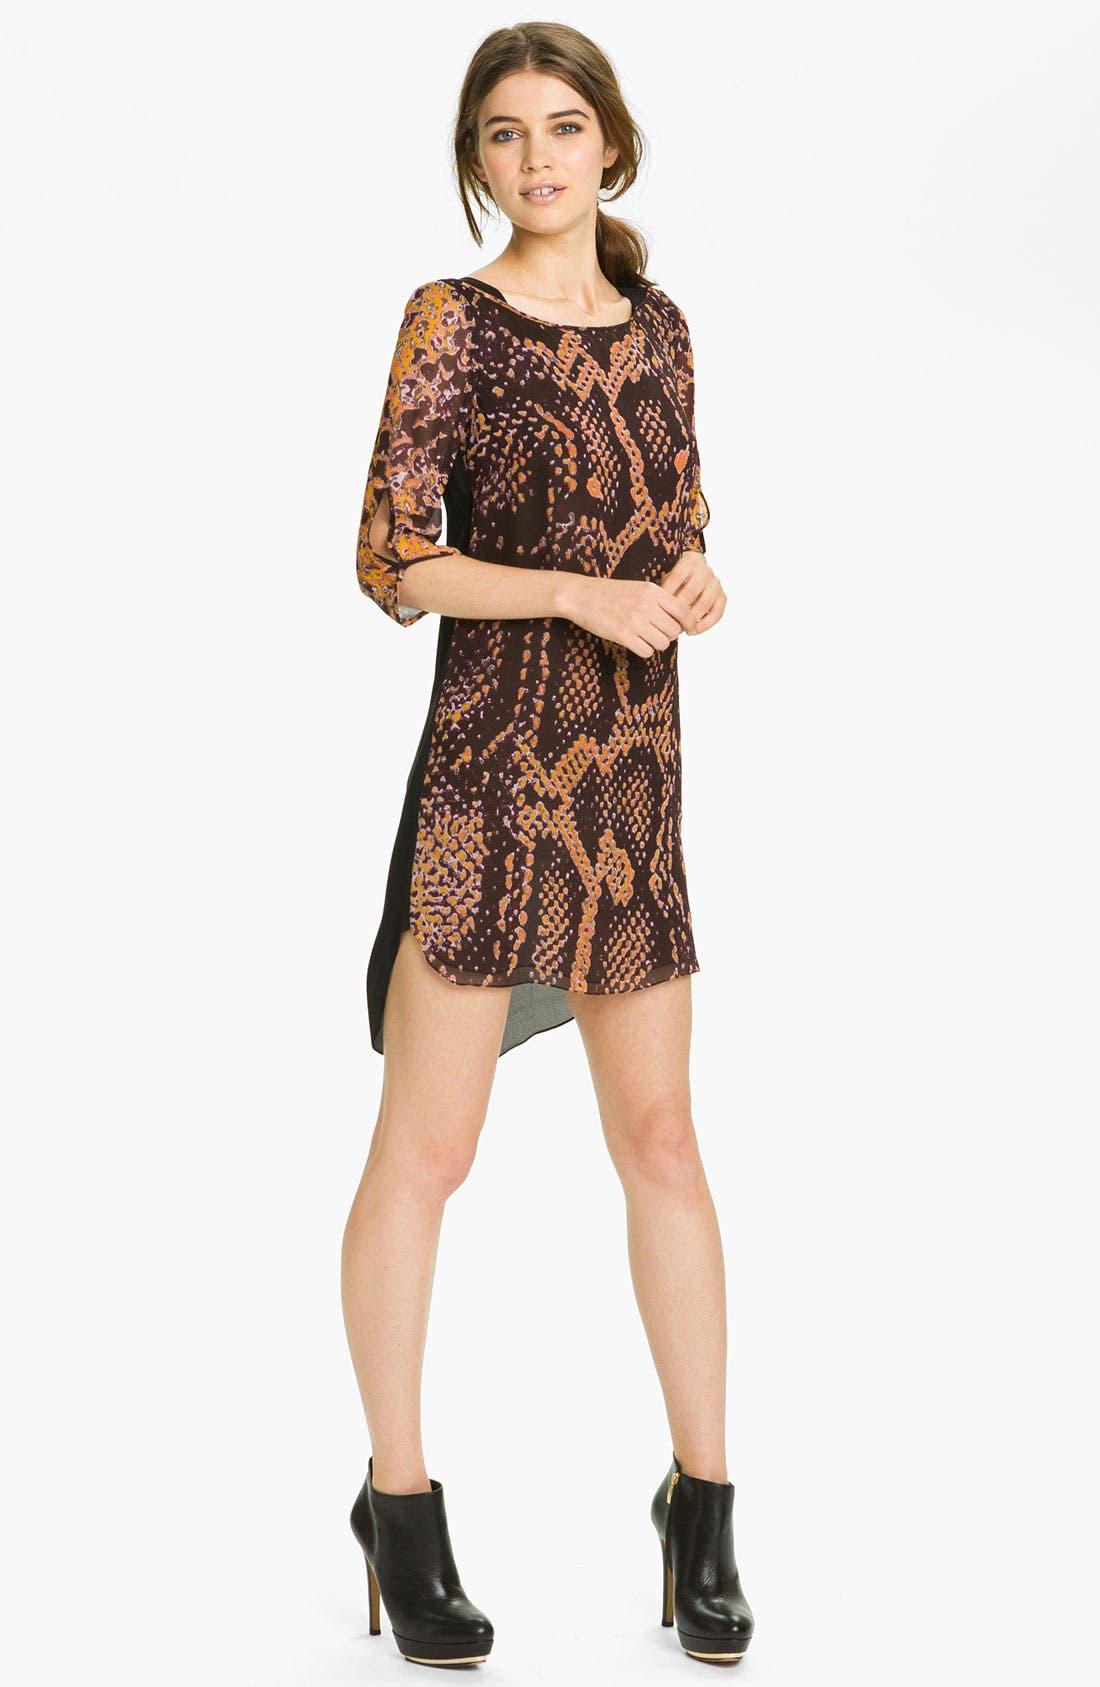 Alternate Image 1 Selected - Rebecca Minkoff 'Wednesday' Snake Print Dress